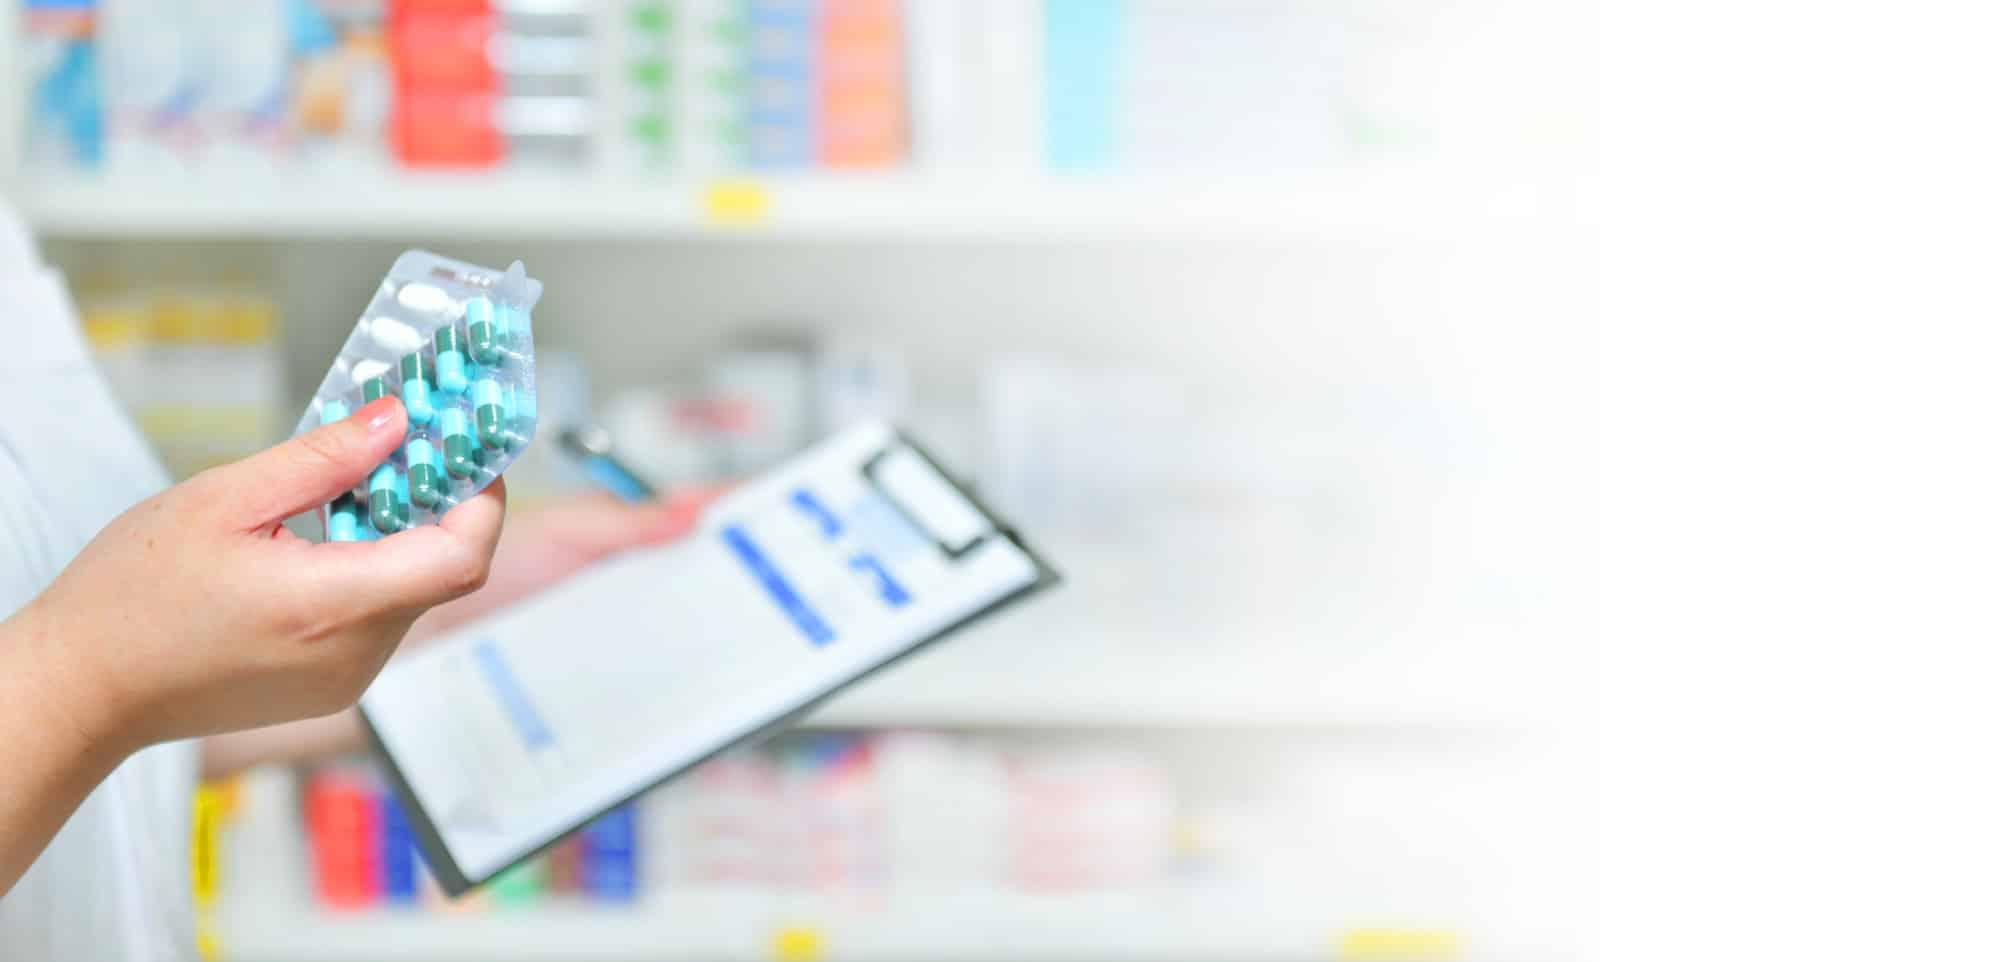 pharmacist filling a medication order